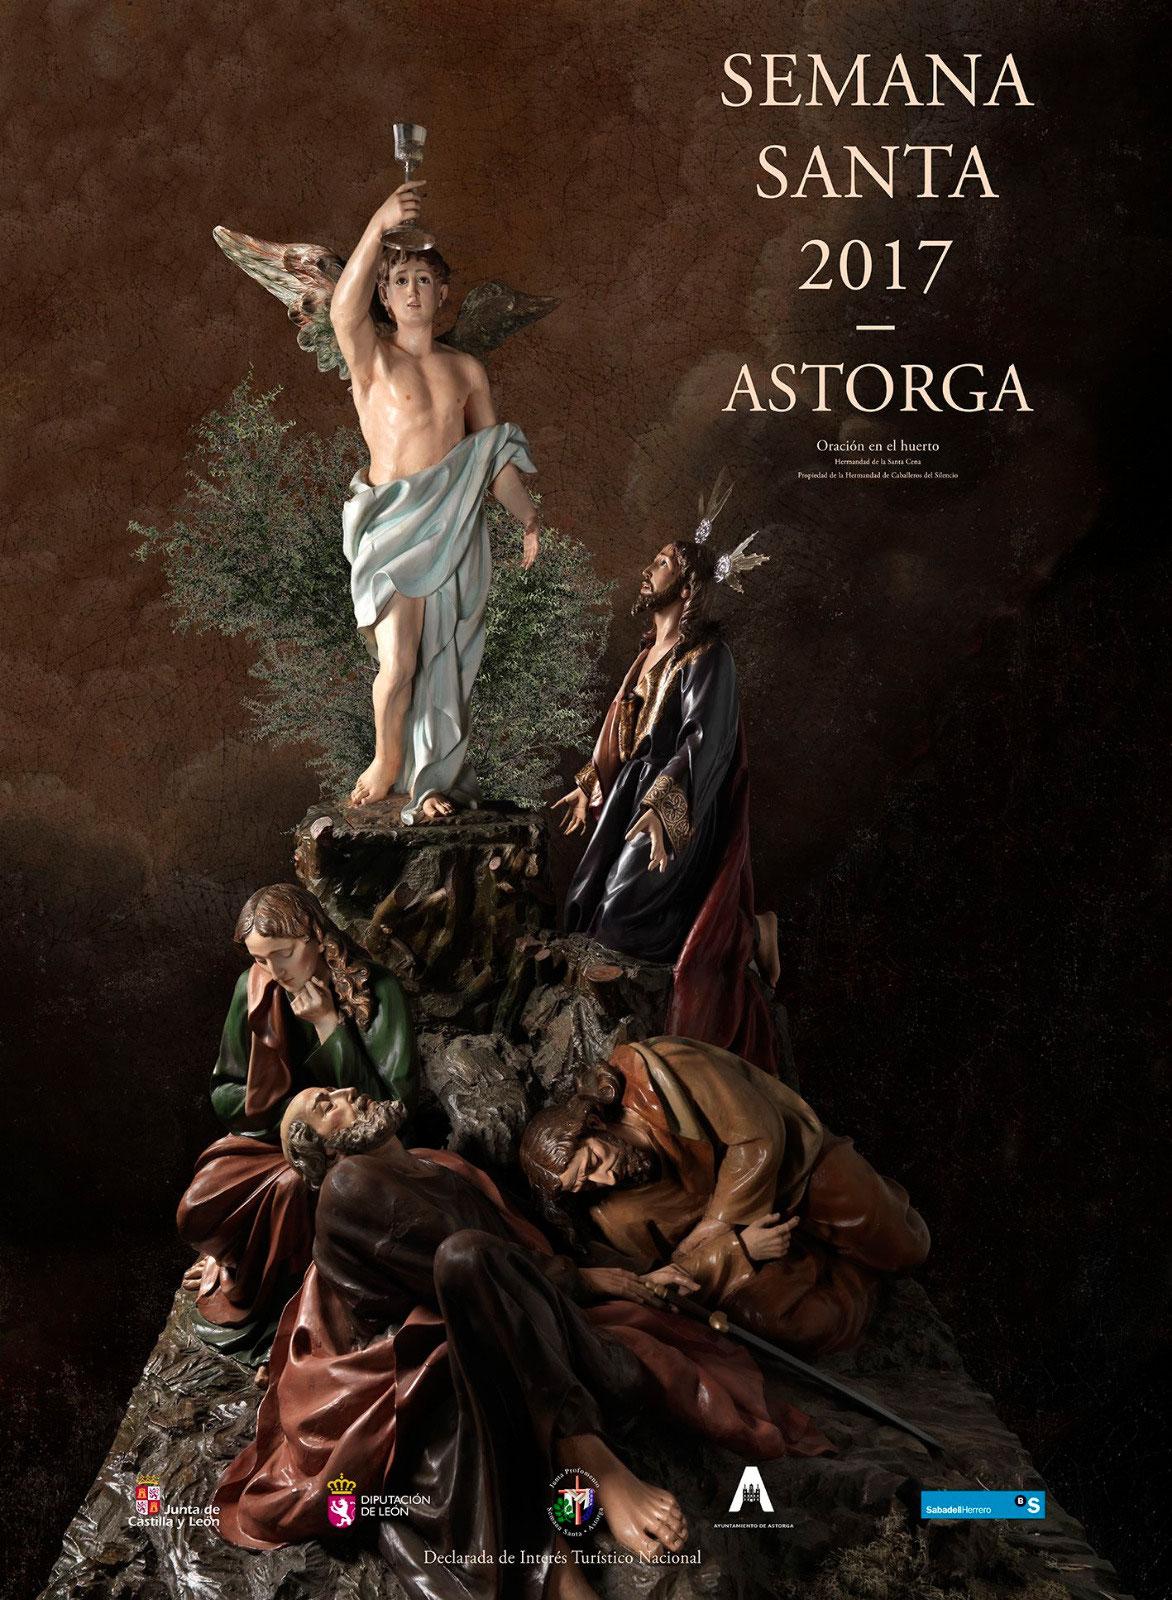 Presentacion Del Cartel De La Semana Santa De Astorga 2017 Pagina